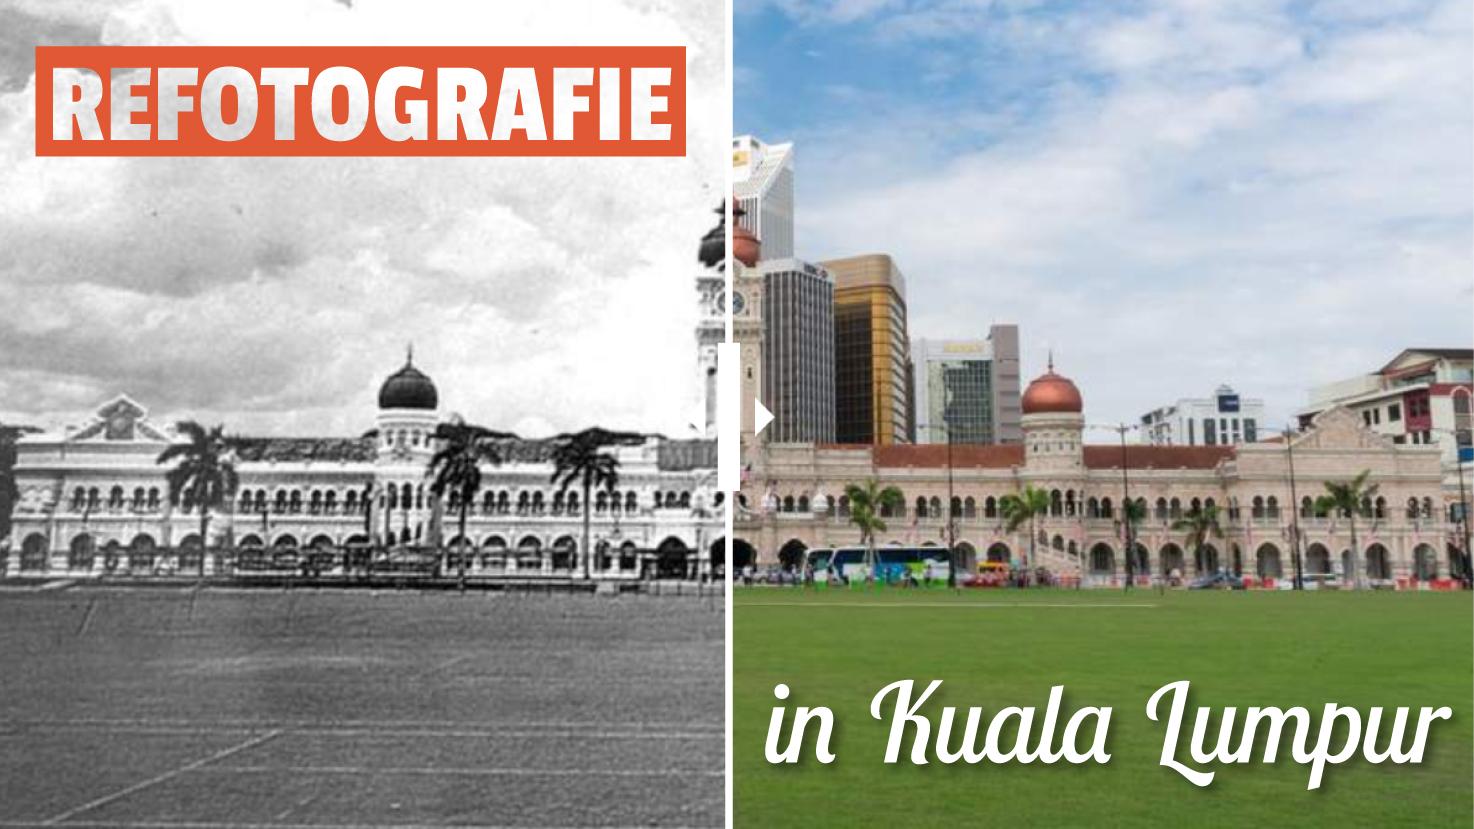 Refotografie in Kuala Lumpur